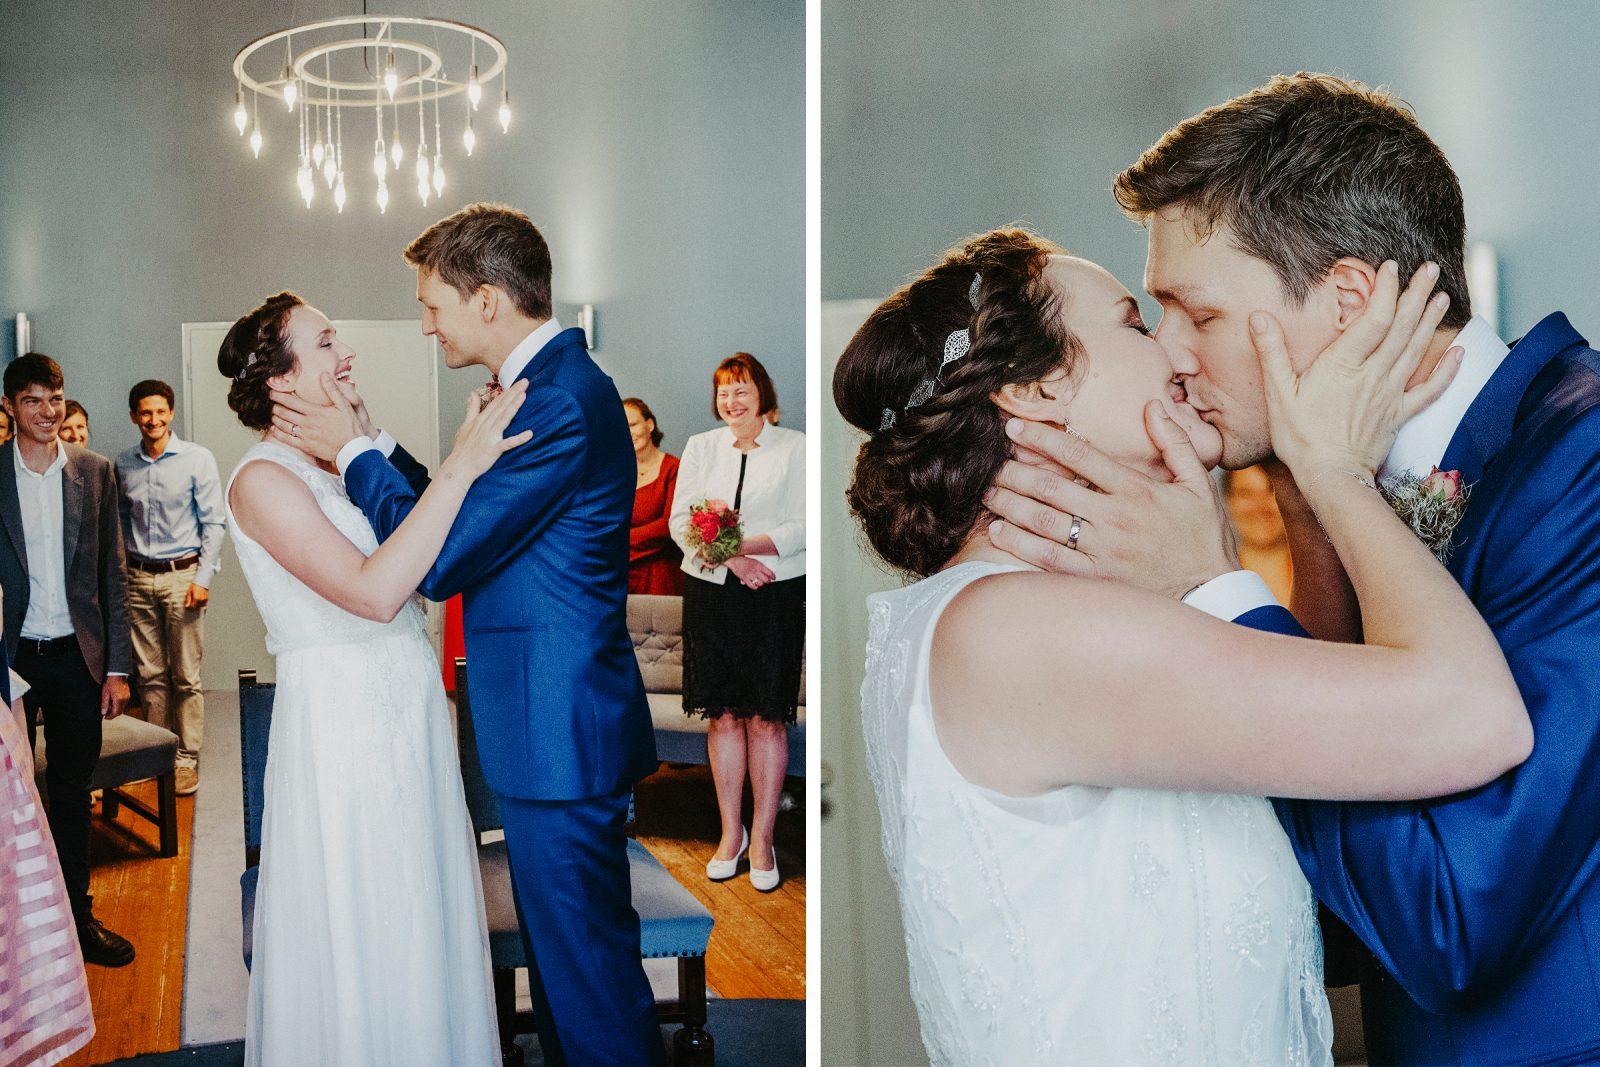 Hochzeit_Potsdam_fotograf_G10